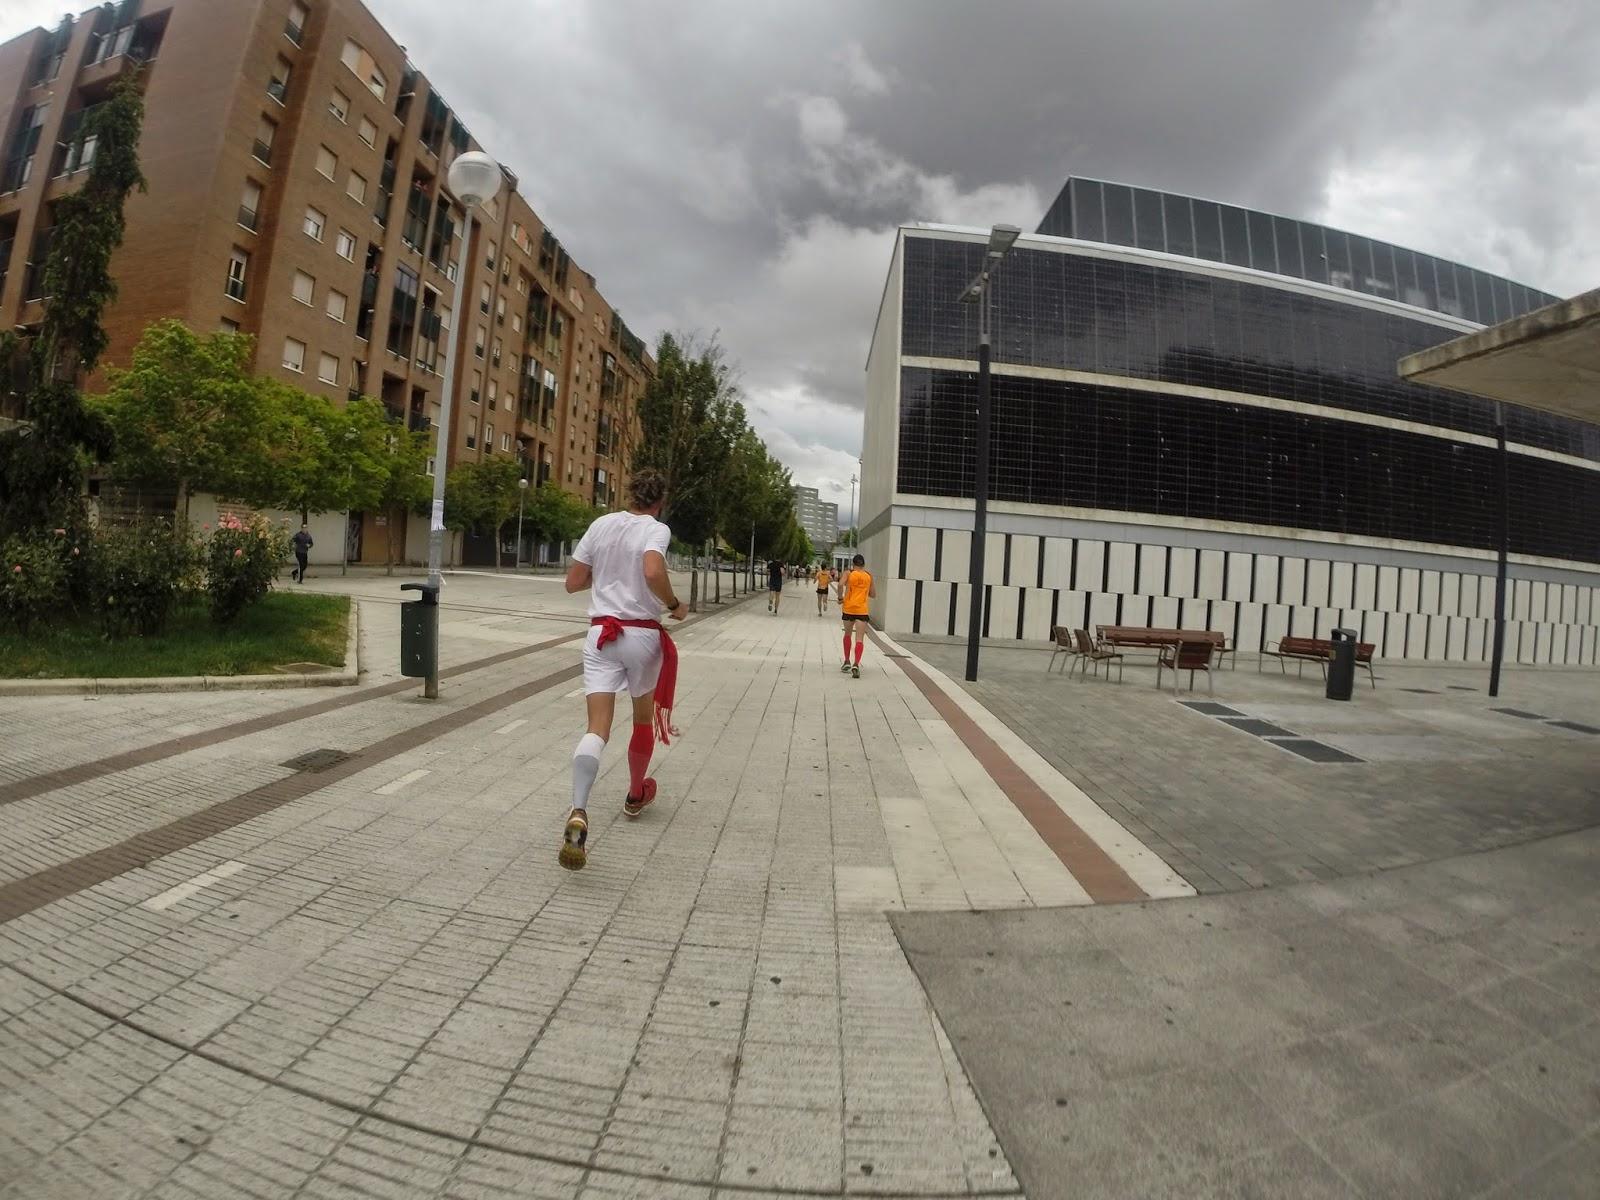 ricardo abad san fermin maraton pamplona 2014